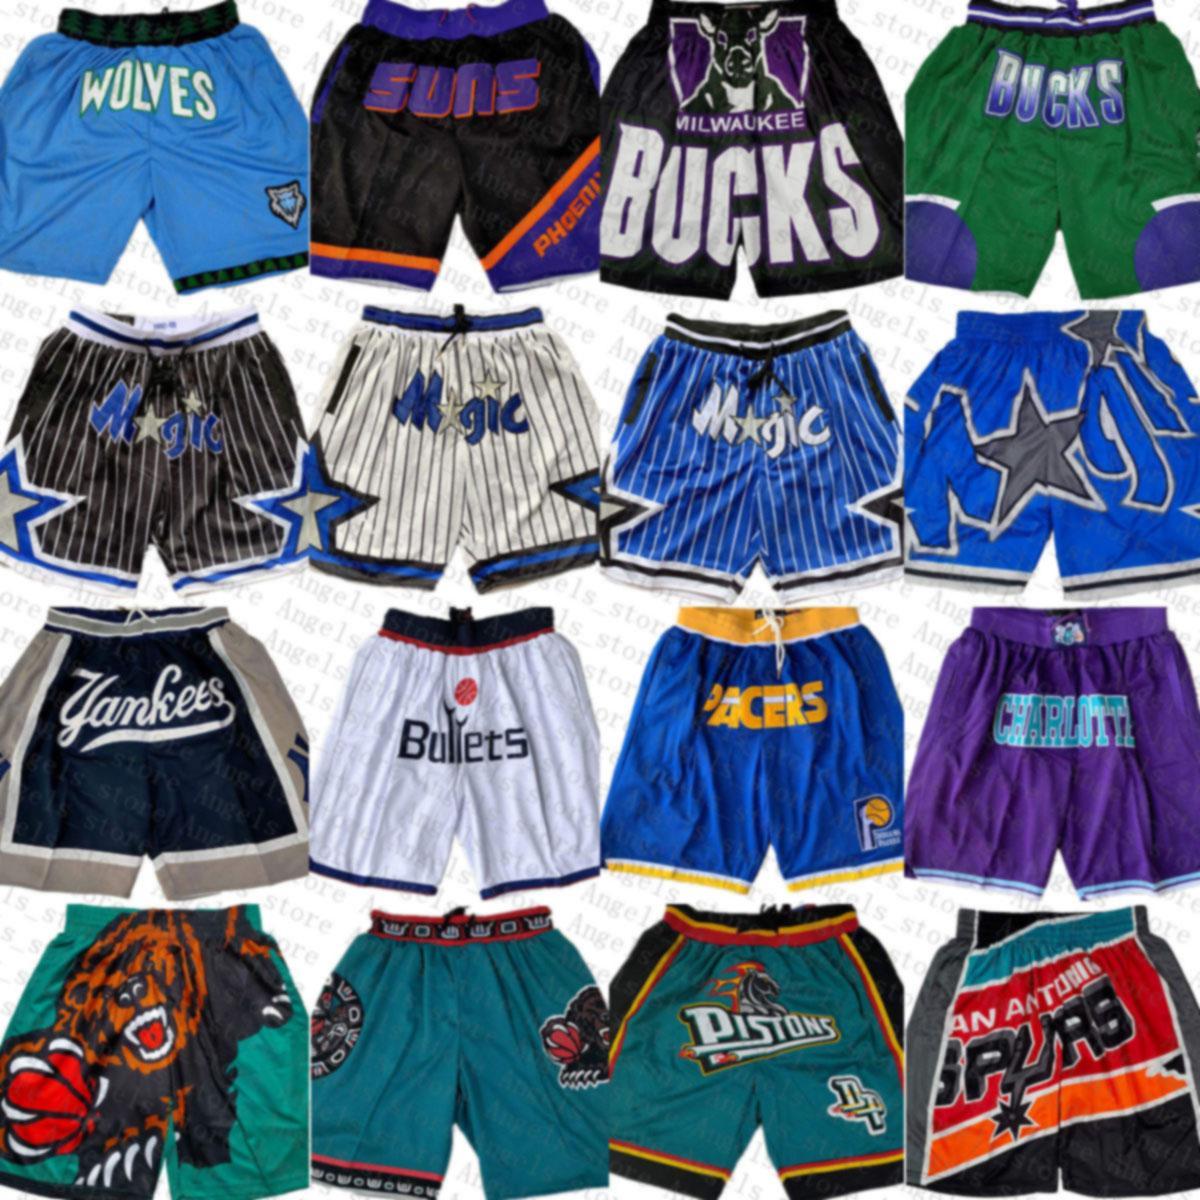 OrlandoMagia Minnesota.TimberwolminIndianaPacers Phoenix.SóisCharlotte.Hornets.Apenas shorts de basquete don